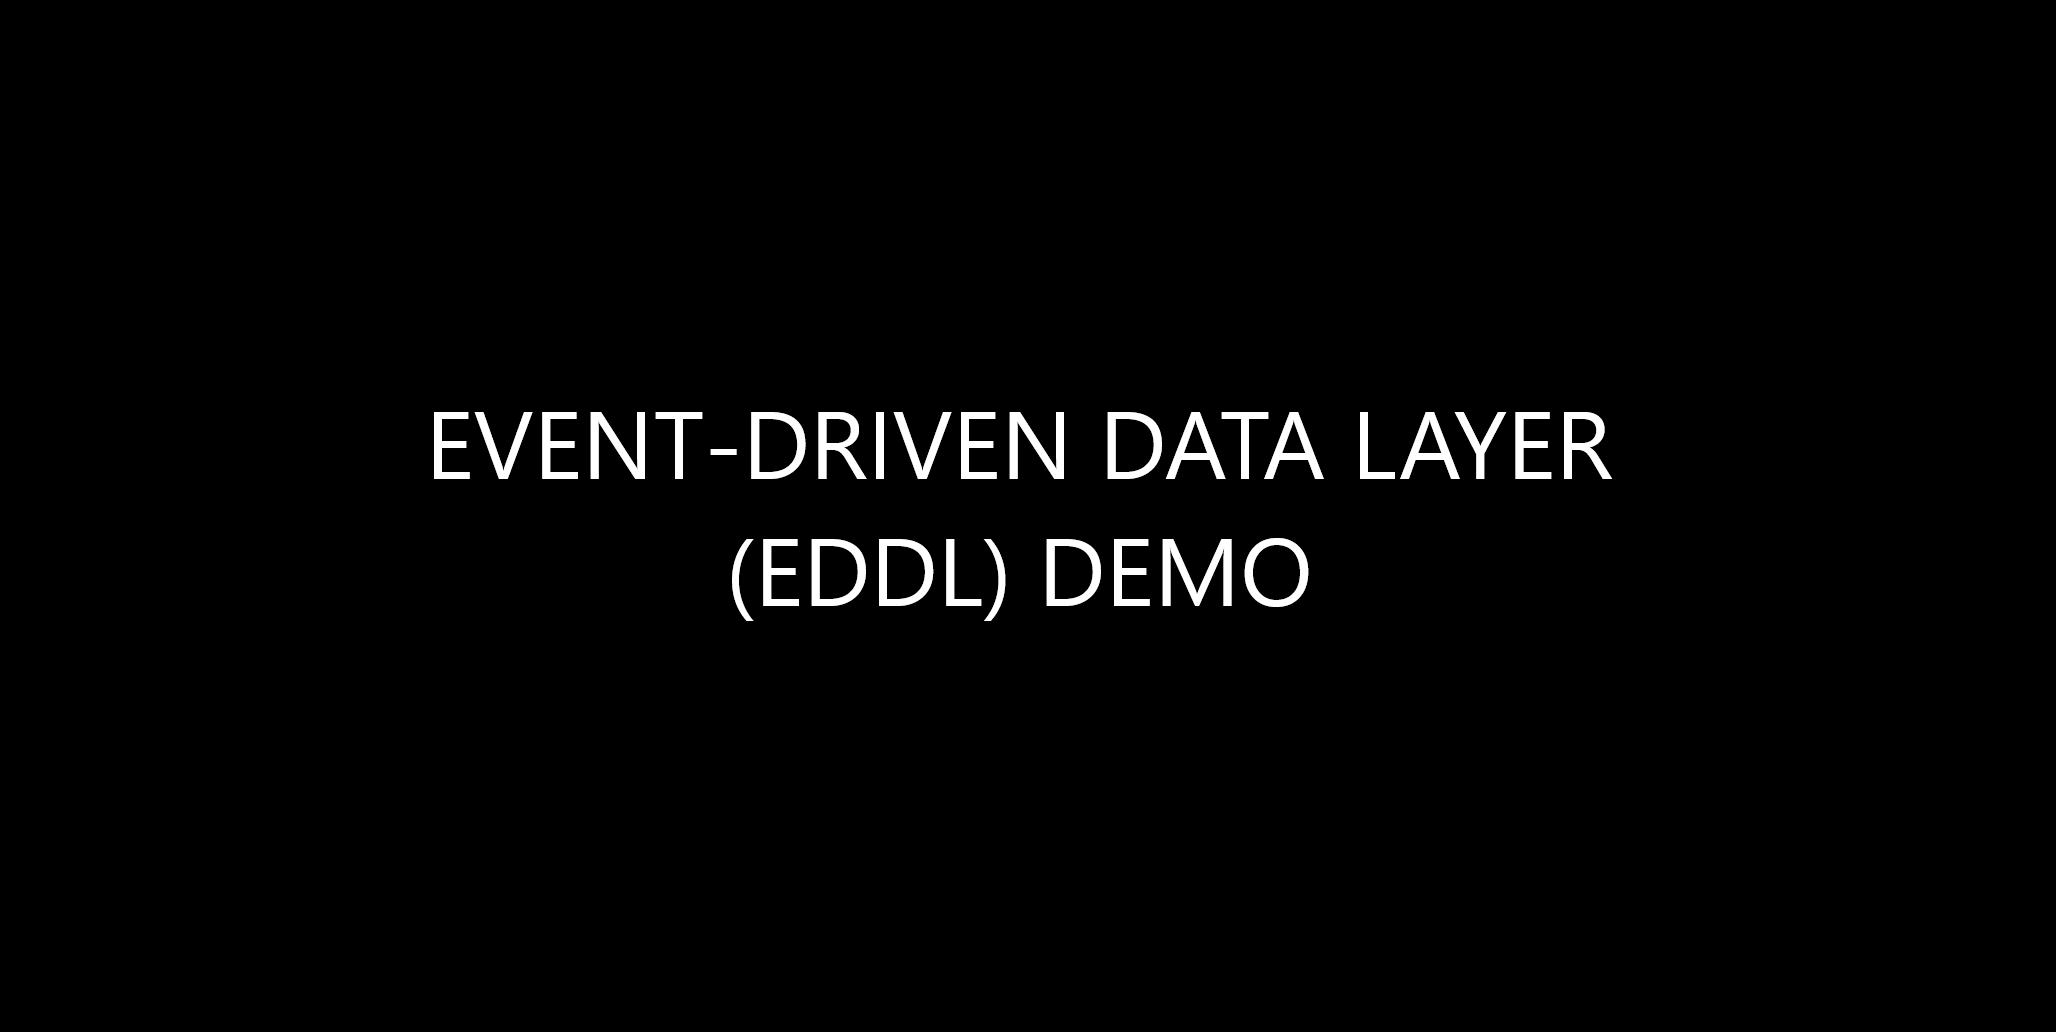 EDDL Demo